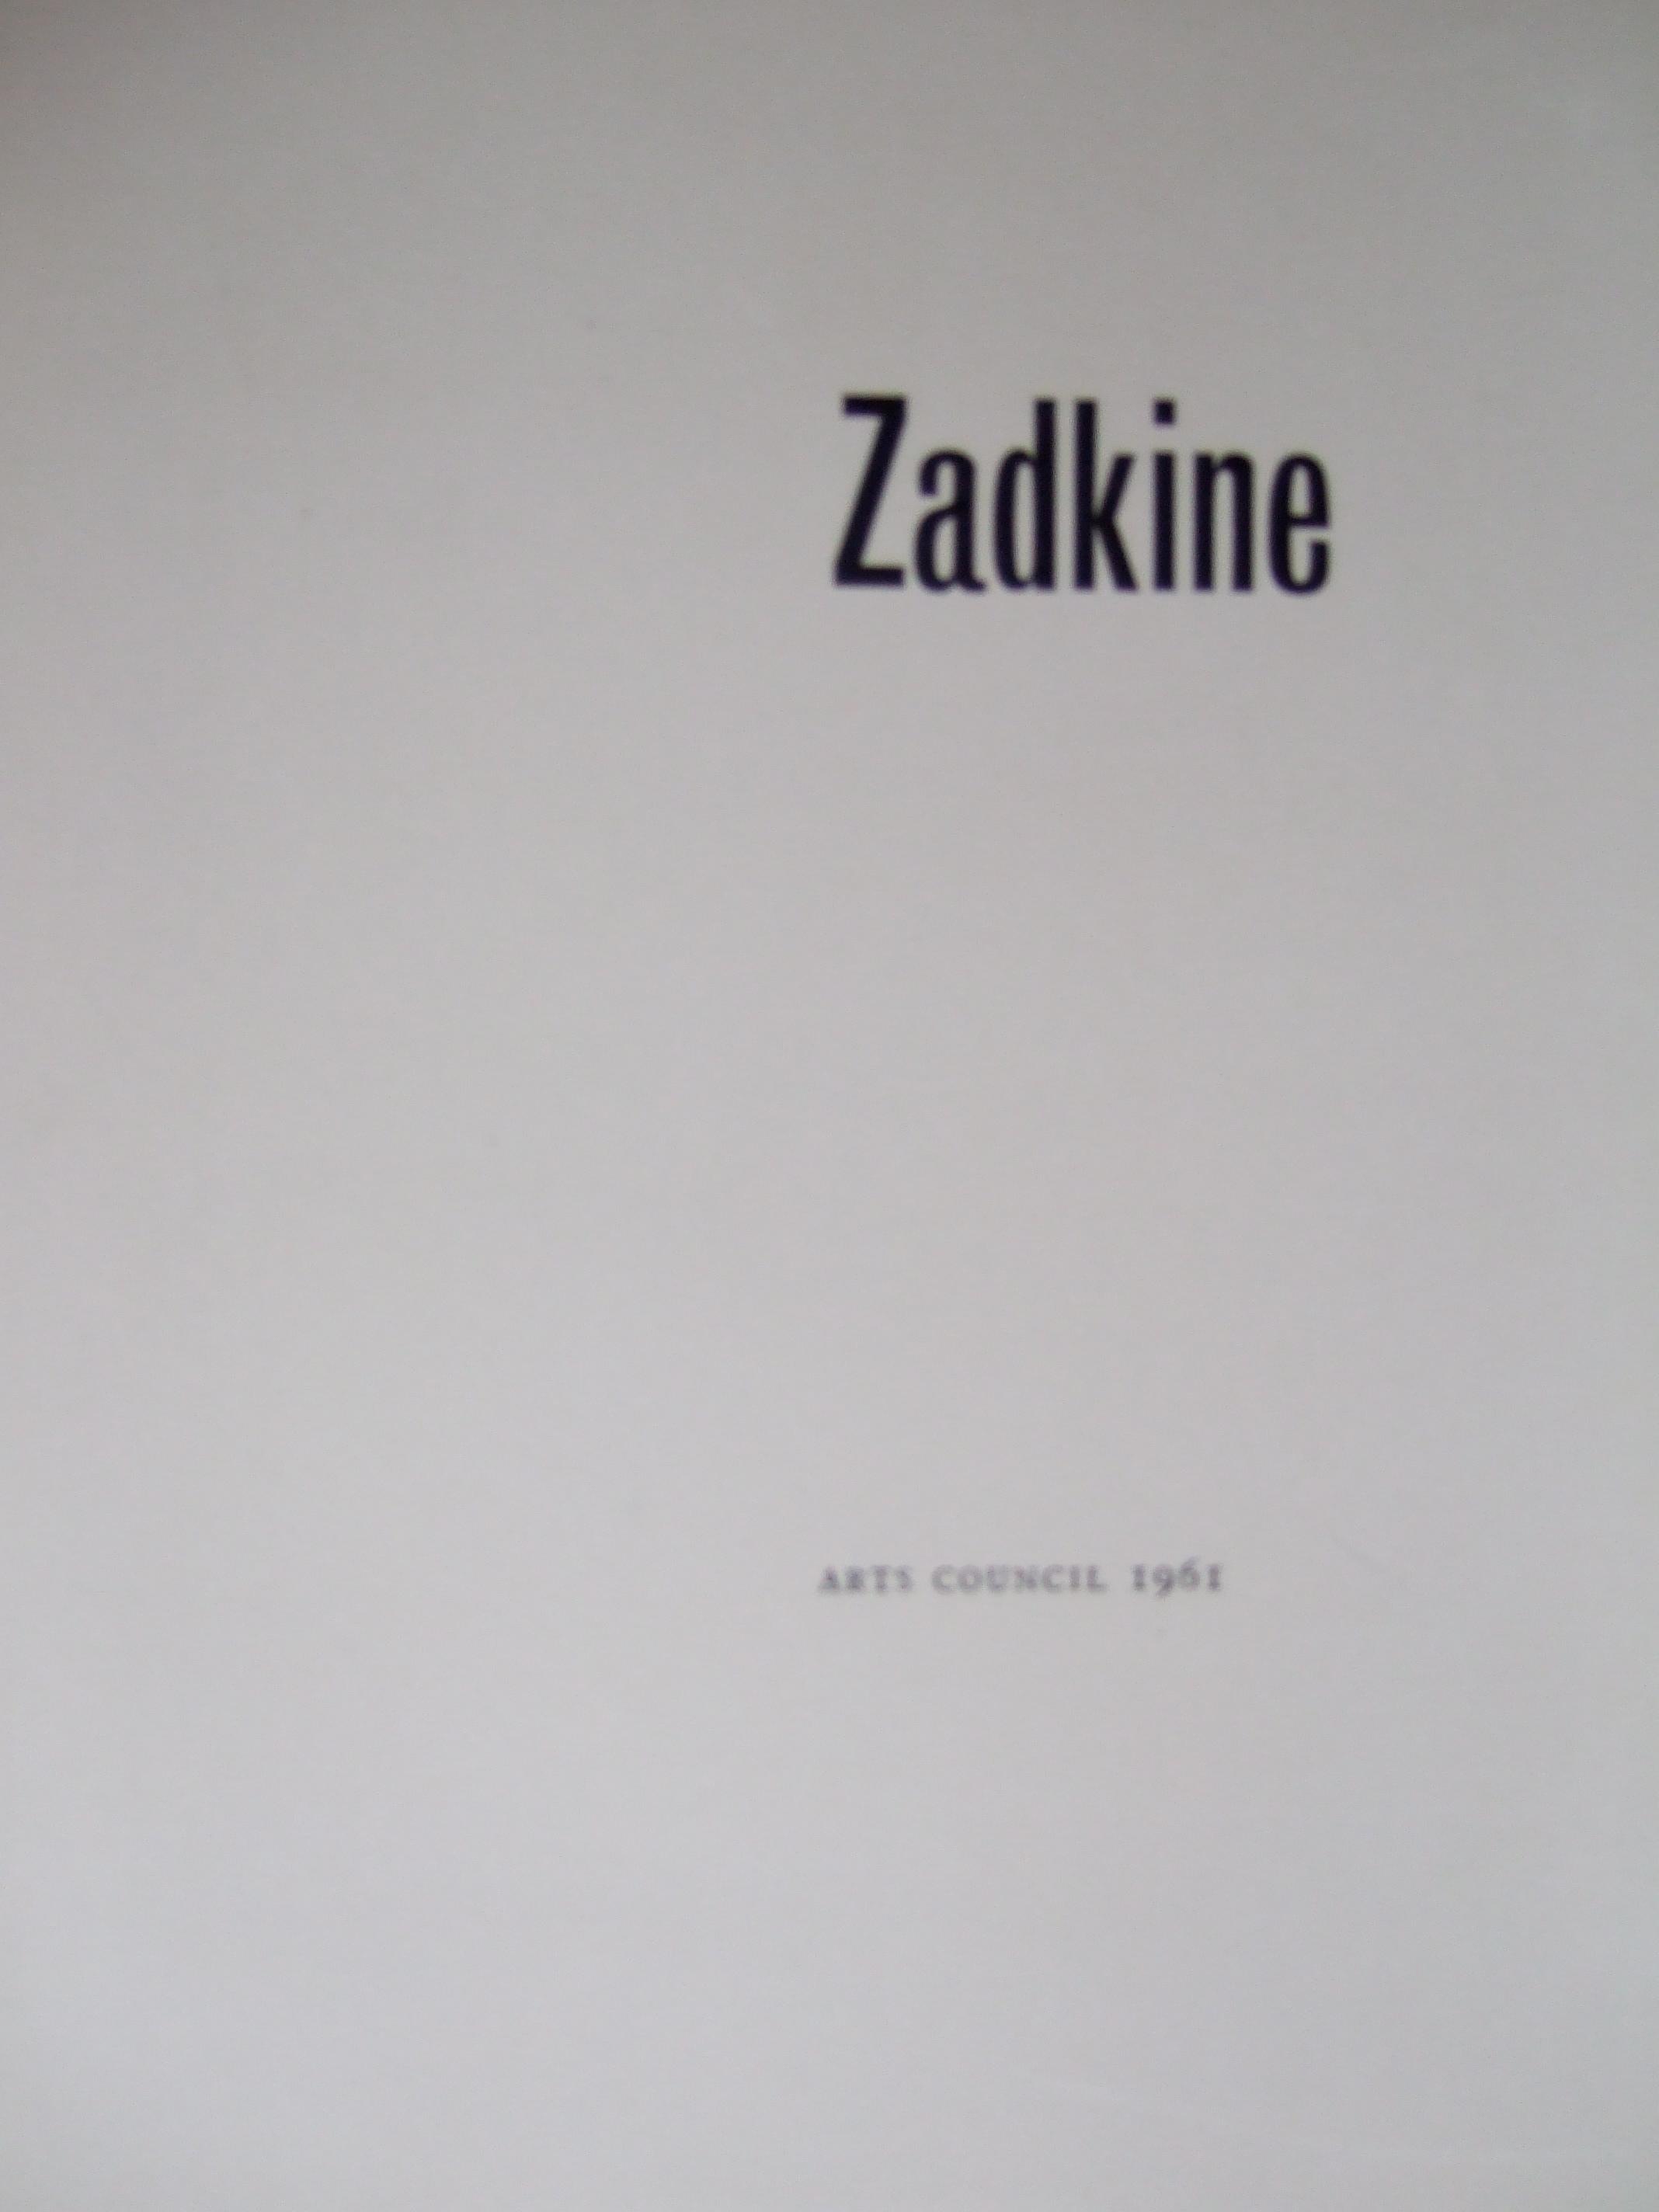 Osip Zadkine